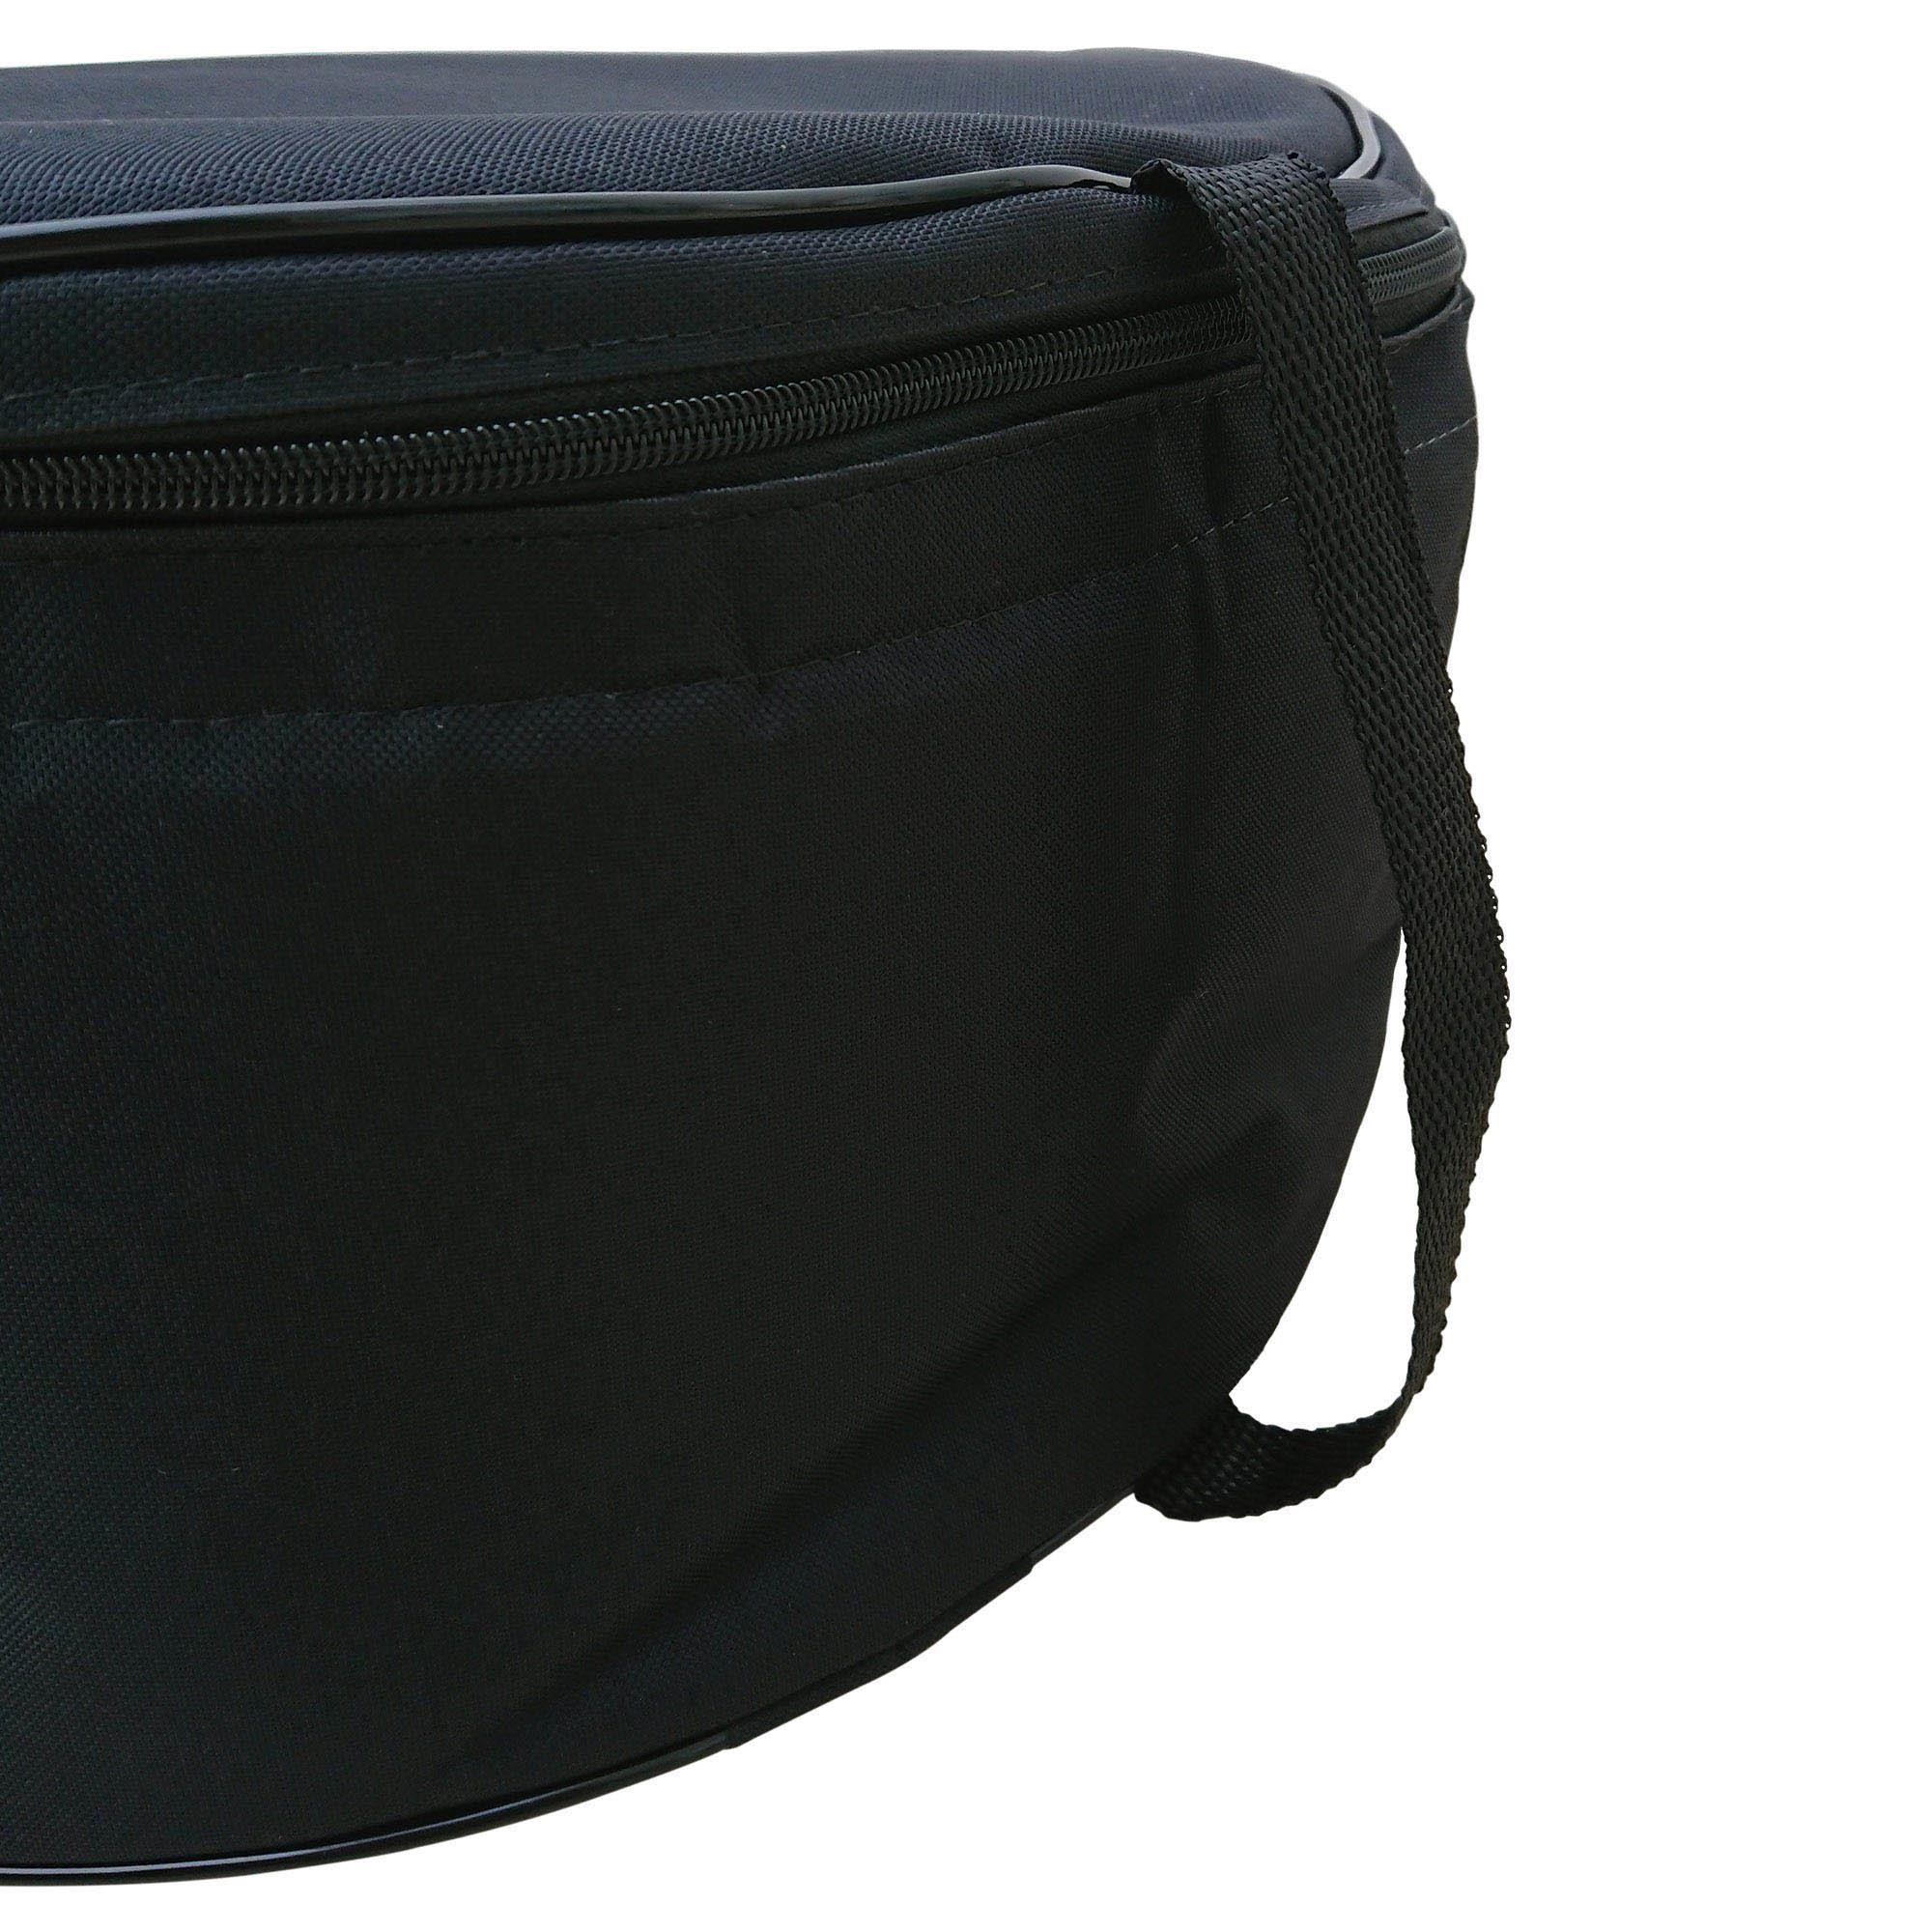 Capa Bag Extra Luxo de Caixa 14 x 6 cm da CLAVE & BAG. Totalmente acolchoada.